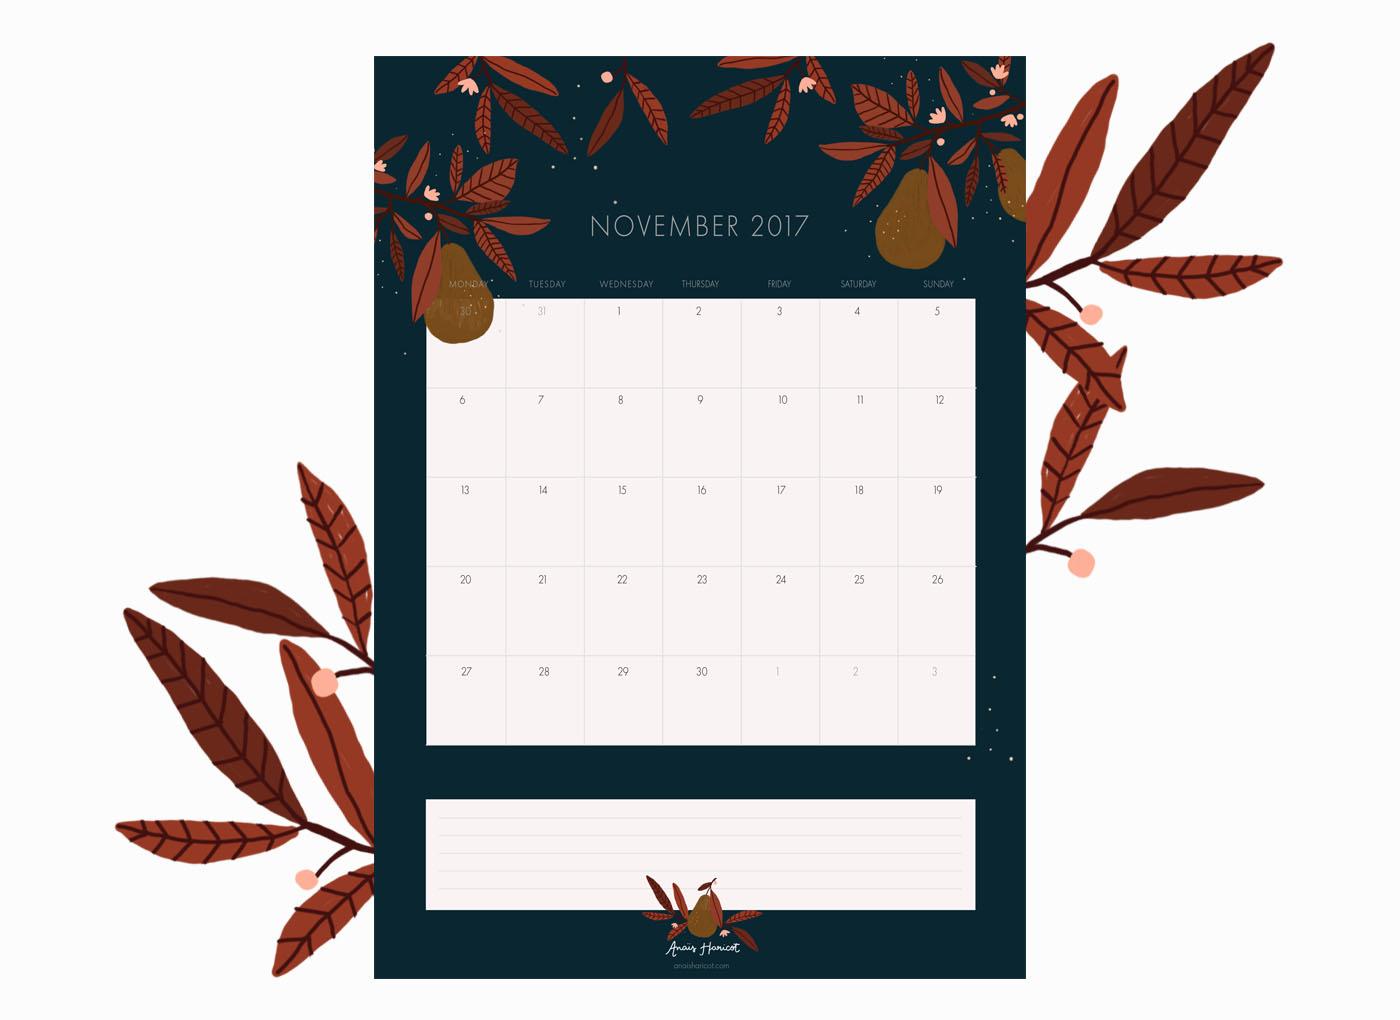 image calendrier novembre mise en situation.jpg